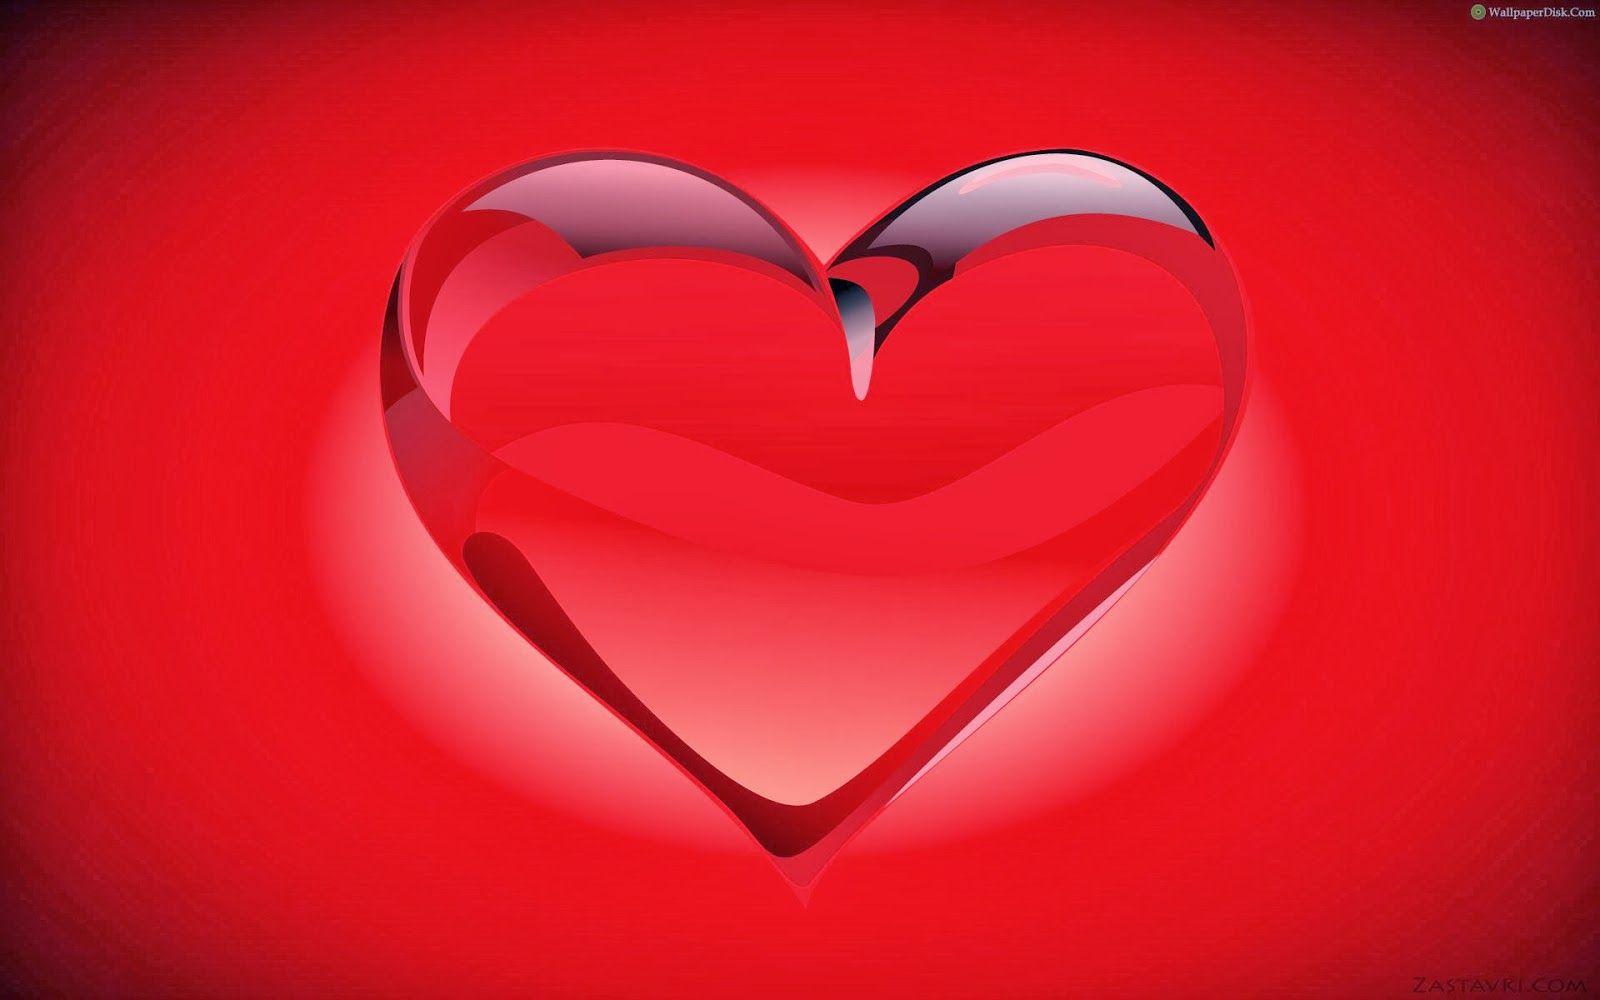 Be my valentine wallpaper be my valentine live wallpaper be my be my valentine wallpaper be my valentine live wallpaper be my valentine live wallpaper apk be my valentine wallpaper be my valentine wallpape biocorpaavc Choice Image